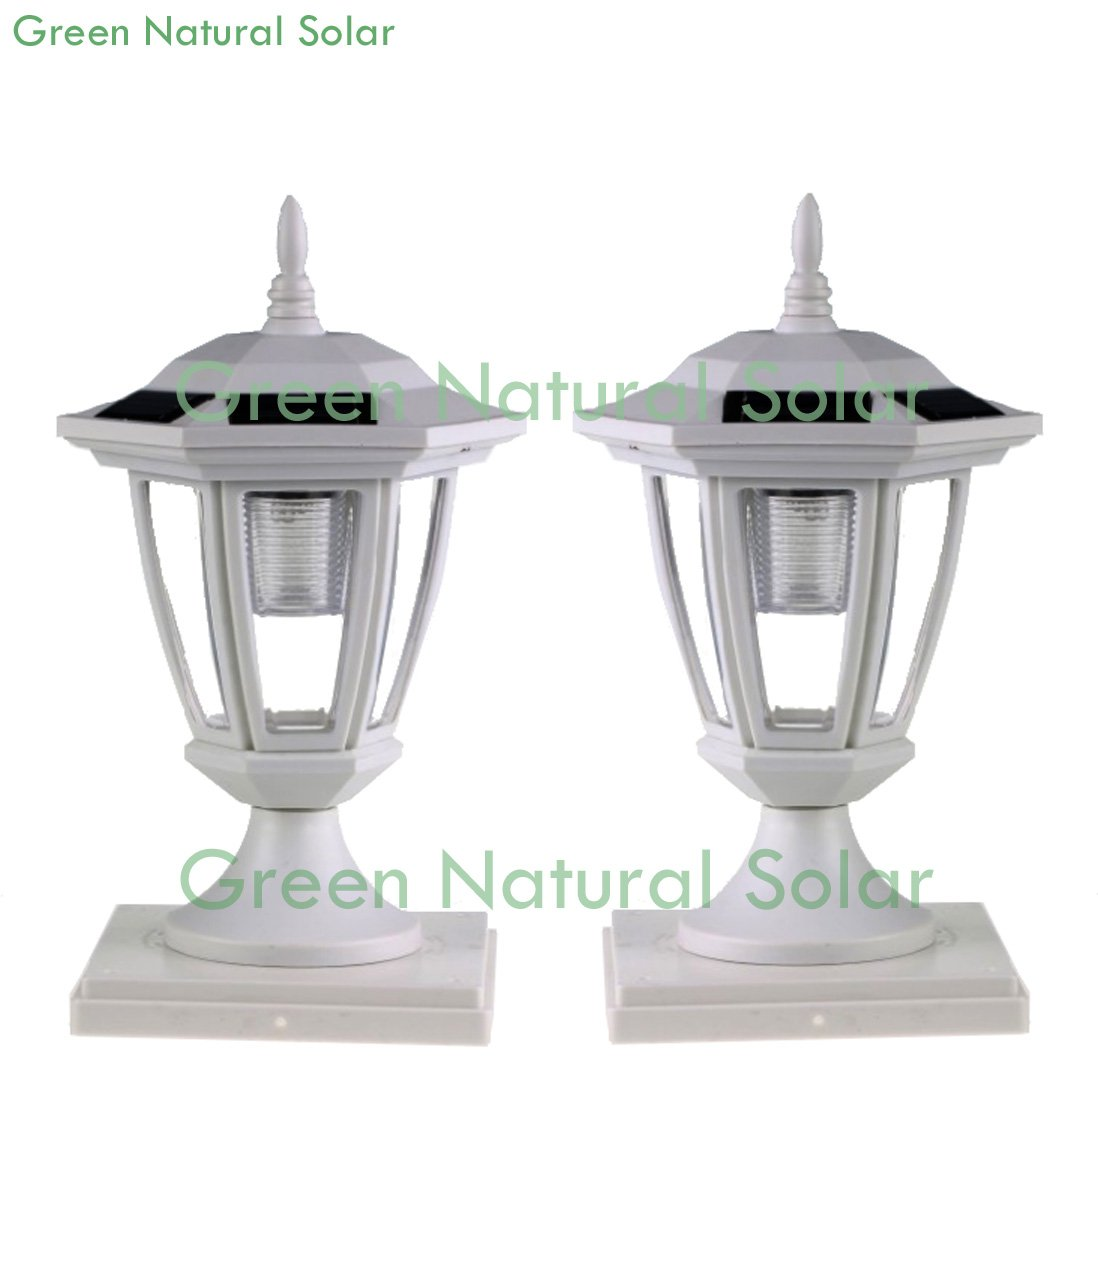 6-Pack WHITE Solar Hexagon Post Cap Lights with WHITE LEDS for 4X4 Hollow PVC/Vinyl/Plastic -GREEN NATURAL SOLAR